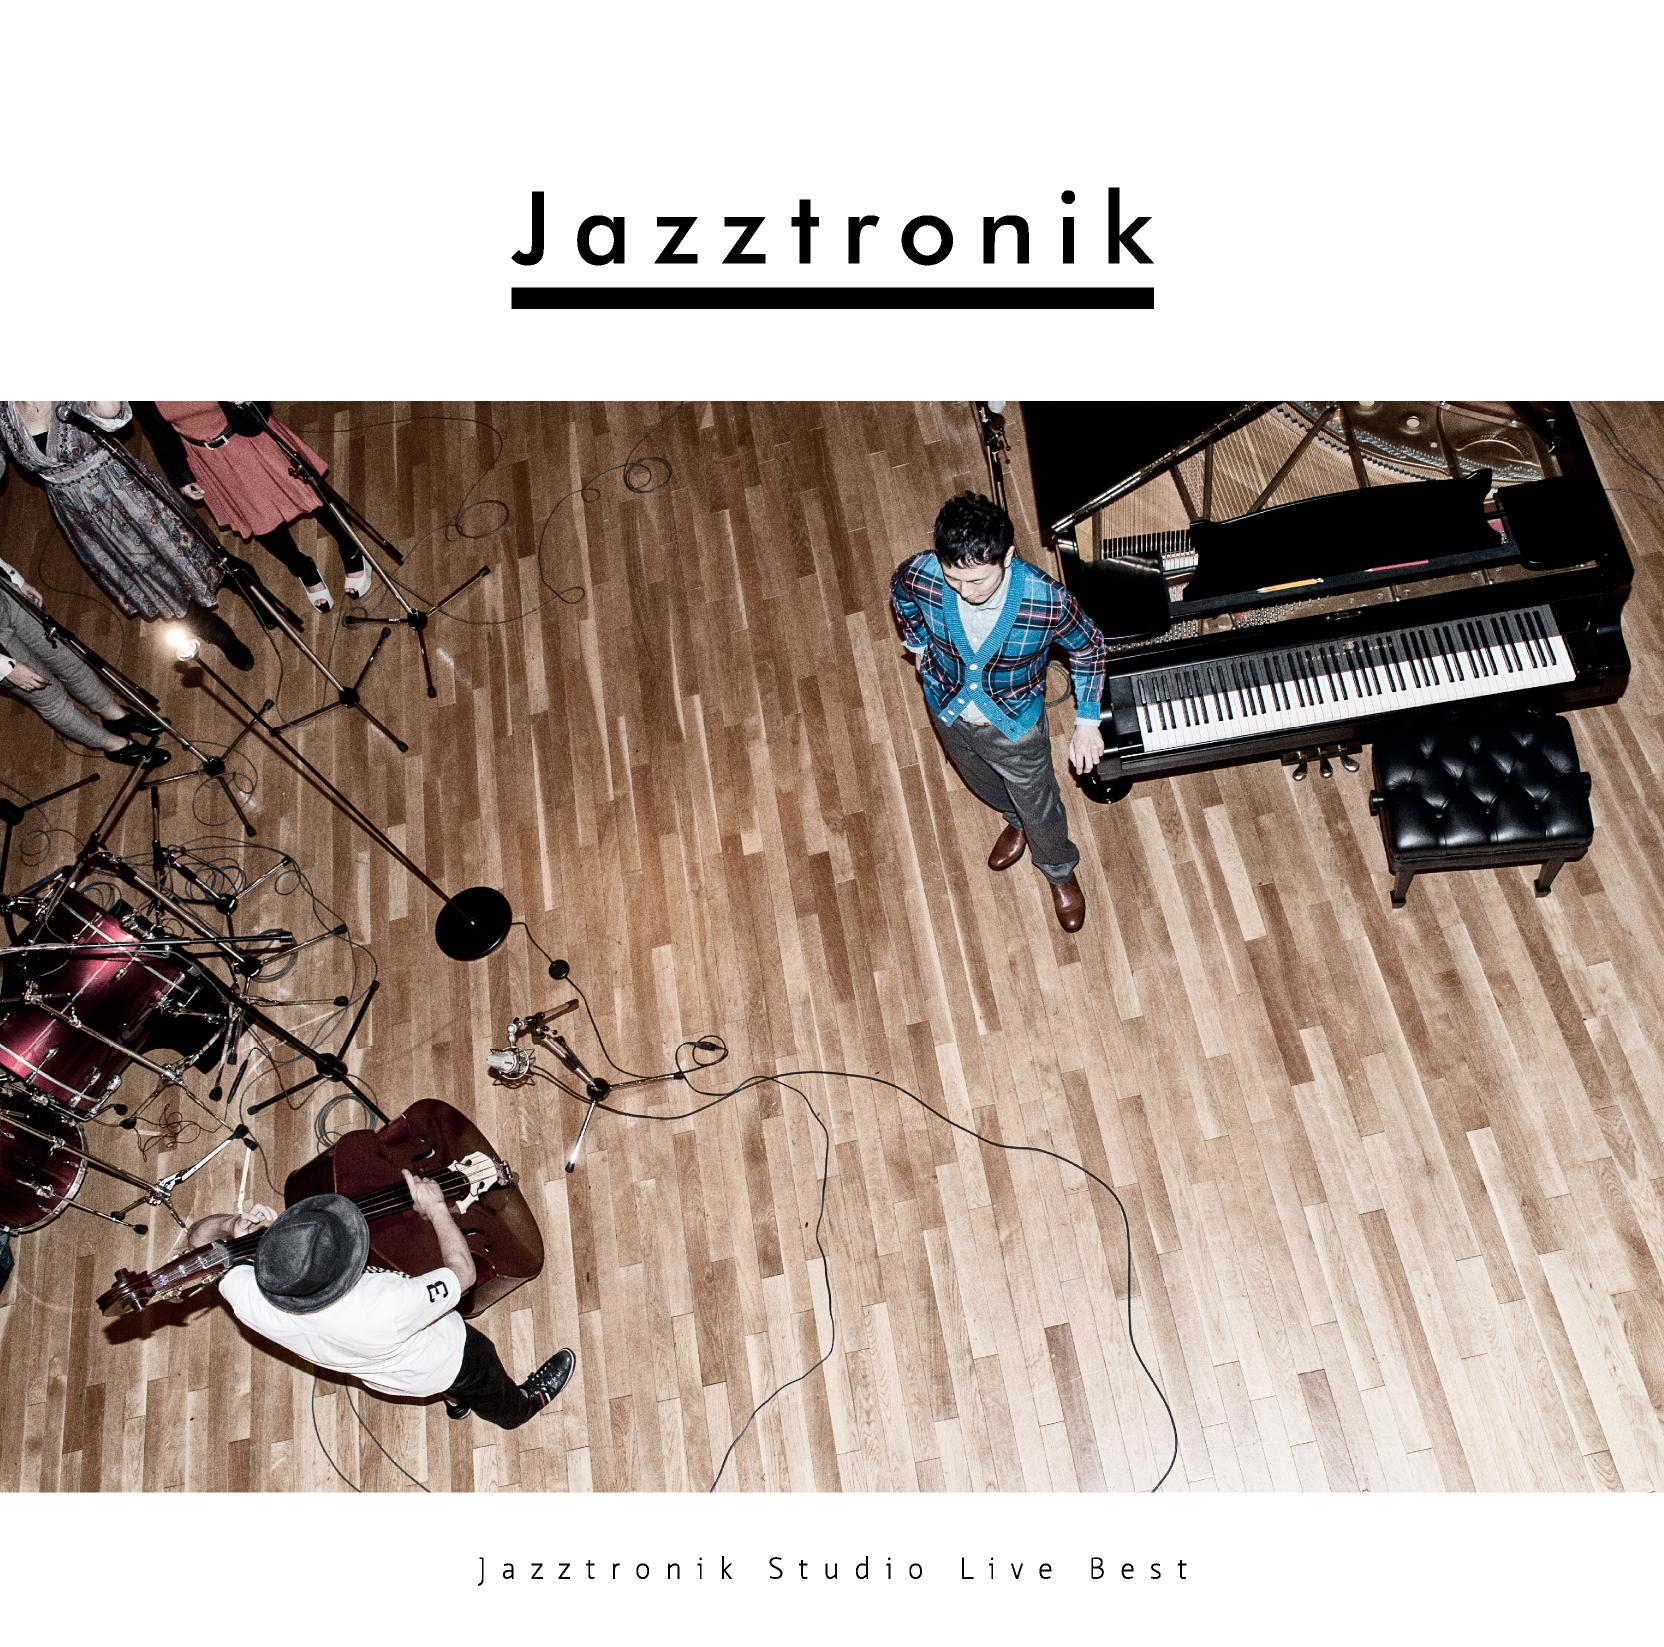 Jazztronik_Jazztronik Studio Live Best